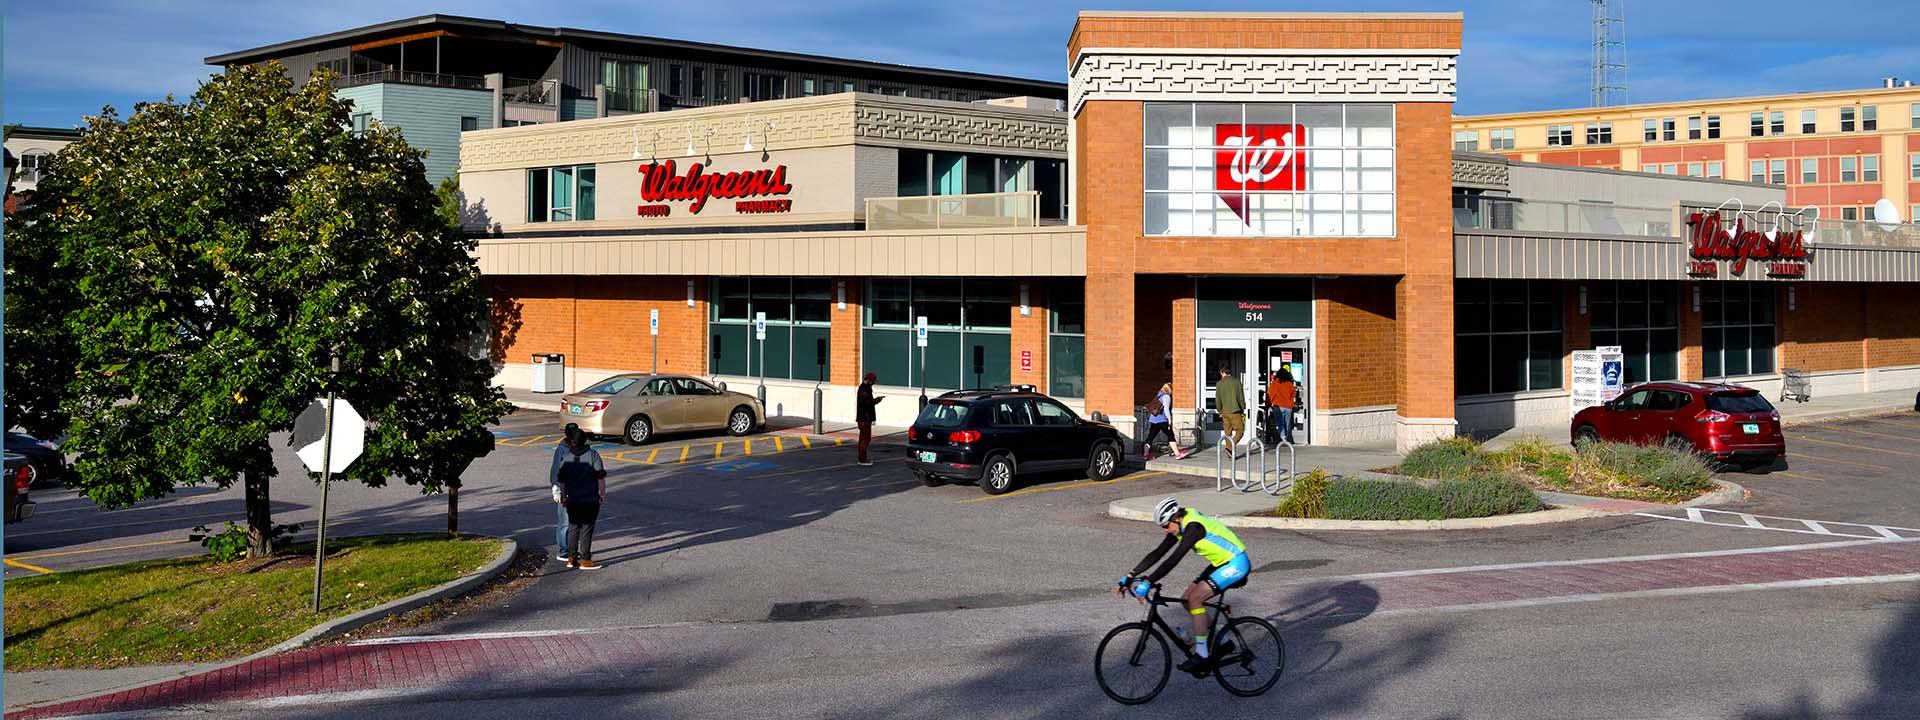 Walgreens Burlington Vermont